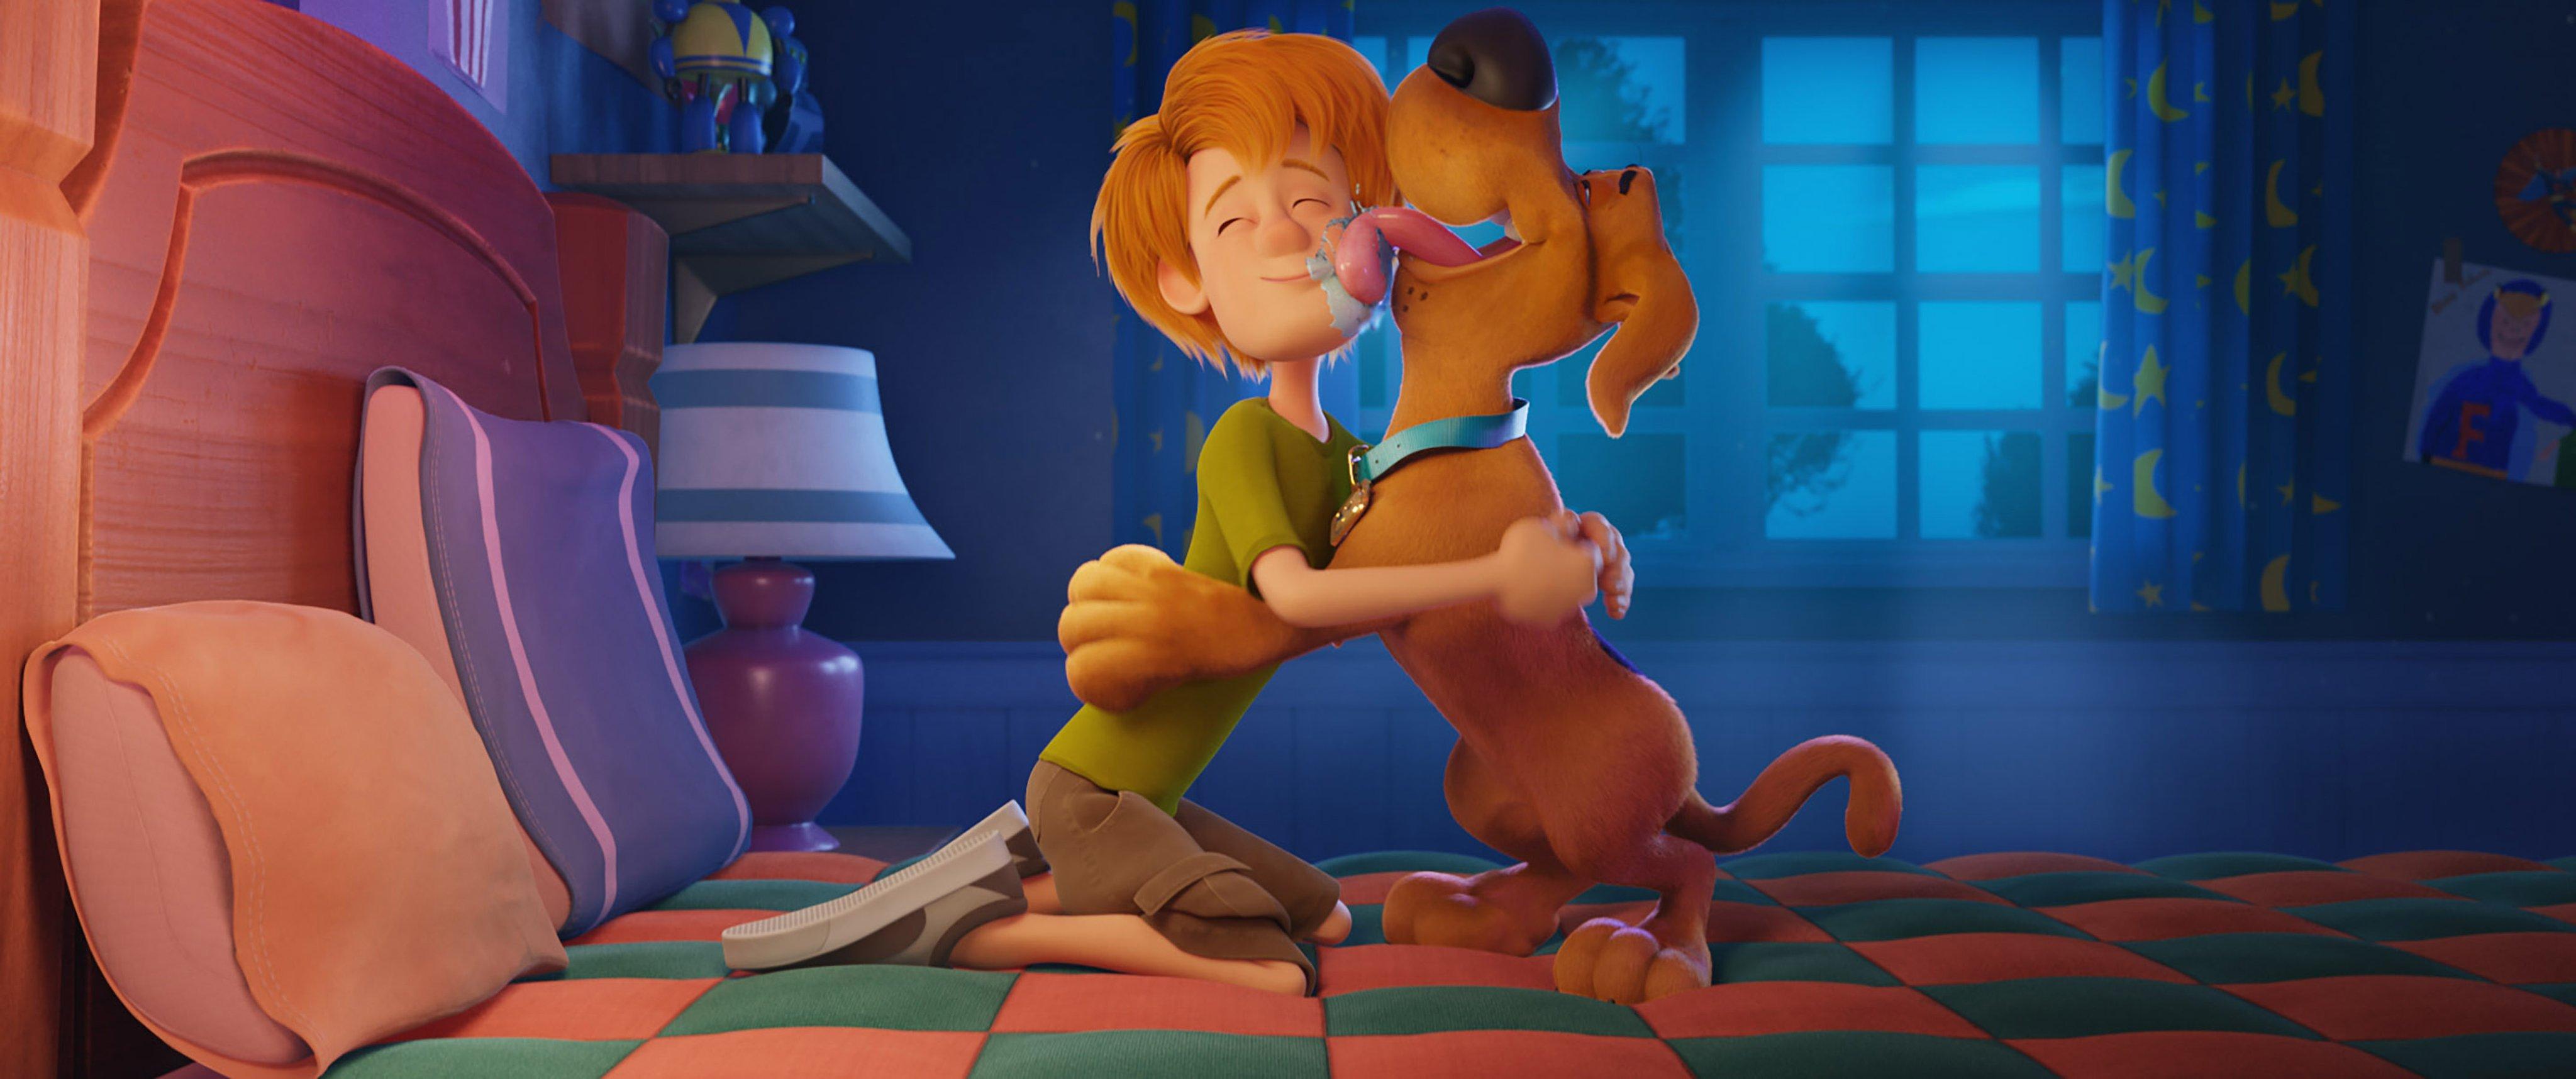 Scoob! Scooby-Doo